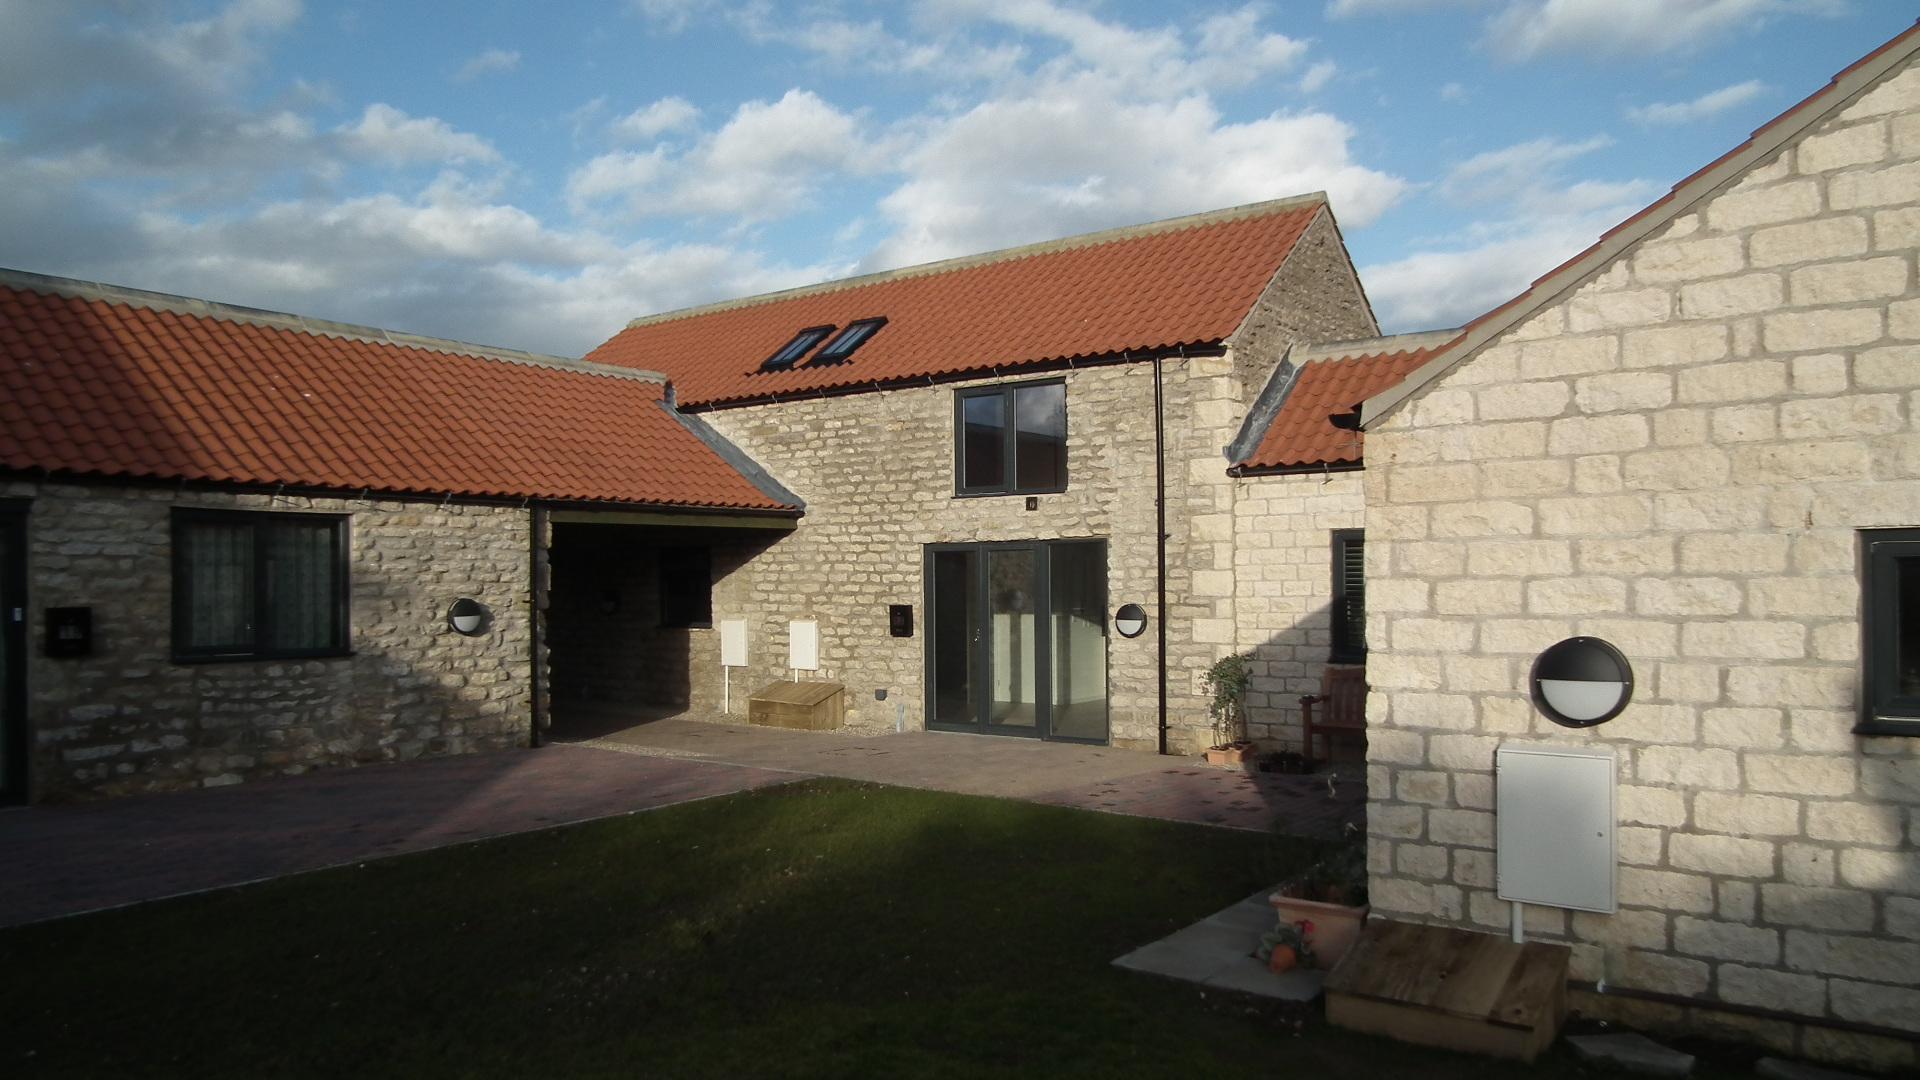 new dwelling - before below